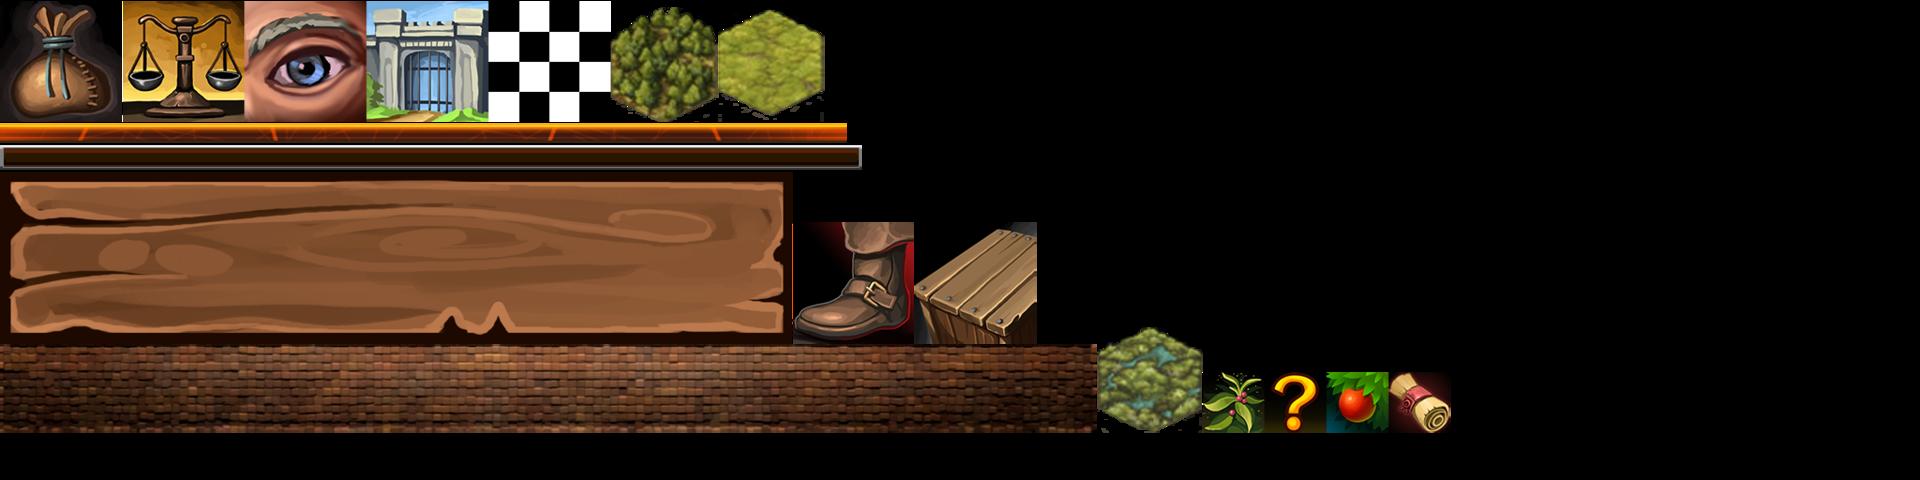 LibGDX + Scene2d (программируем на Kotlin). Часть 2 - 1